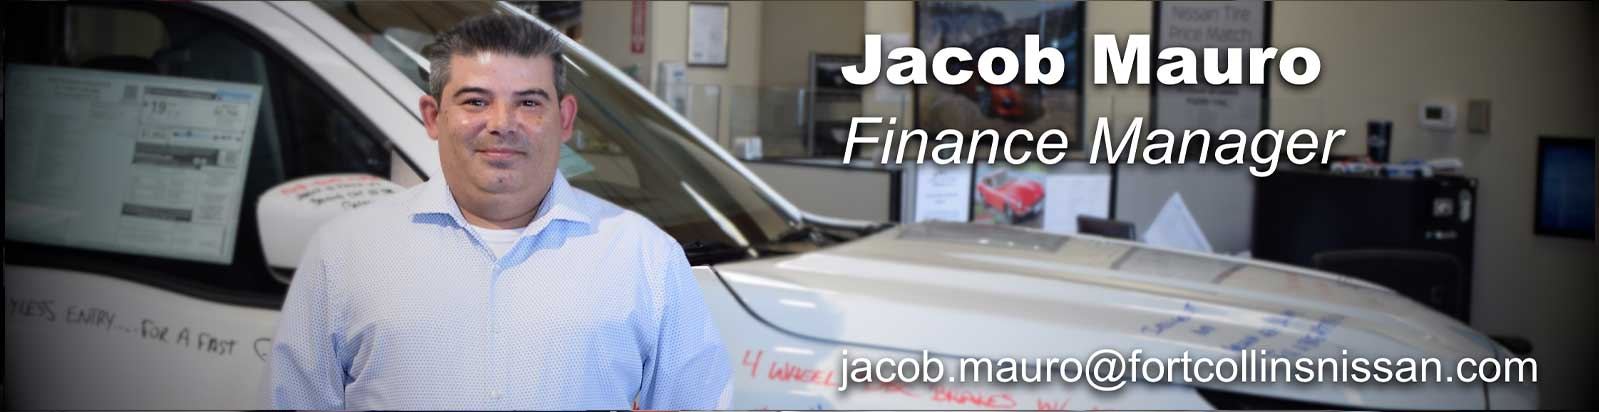 Jacob Mauro